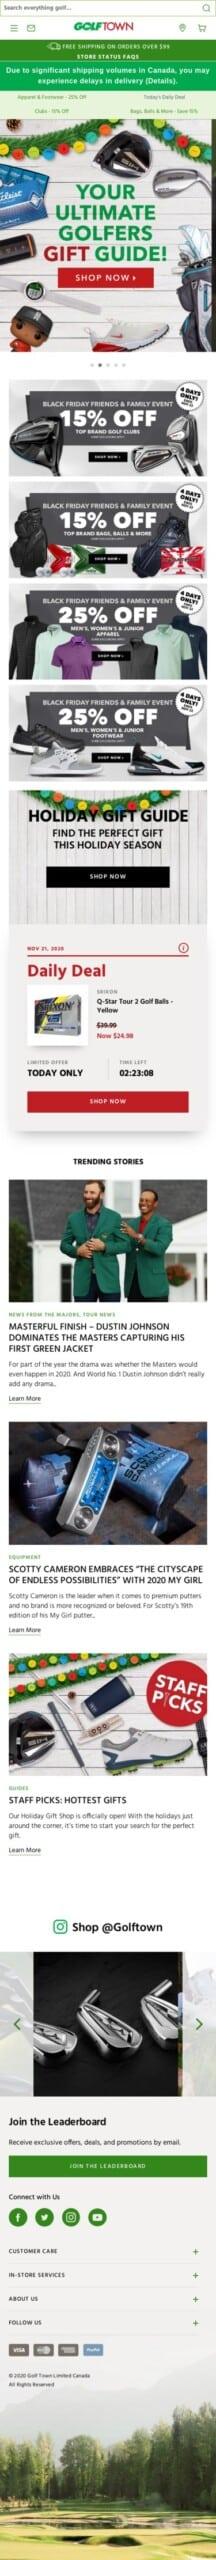 golftown.com Coupon